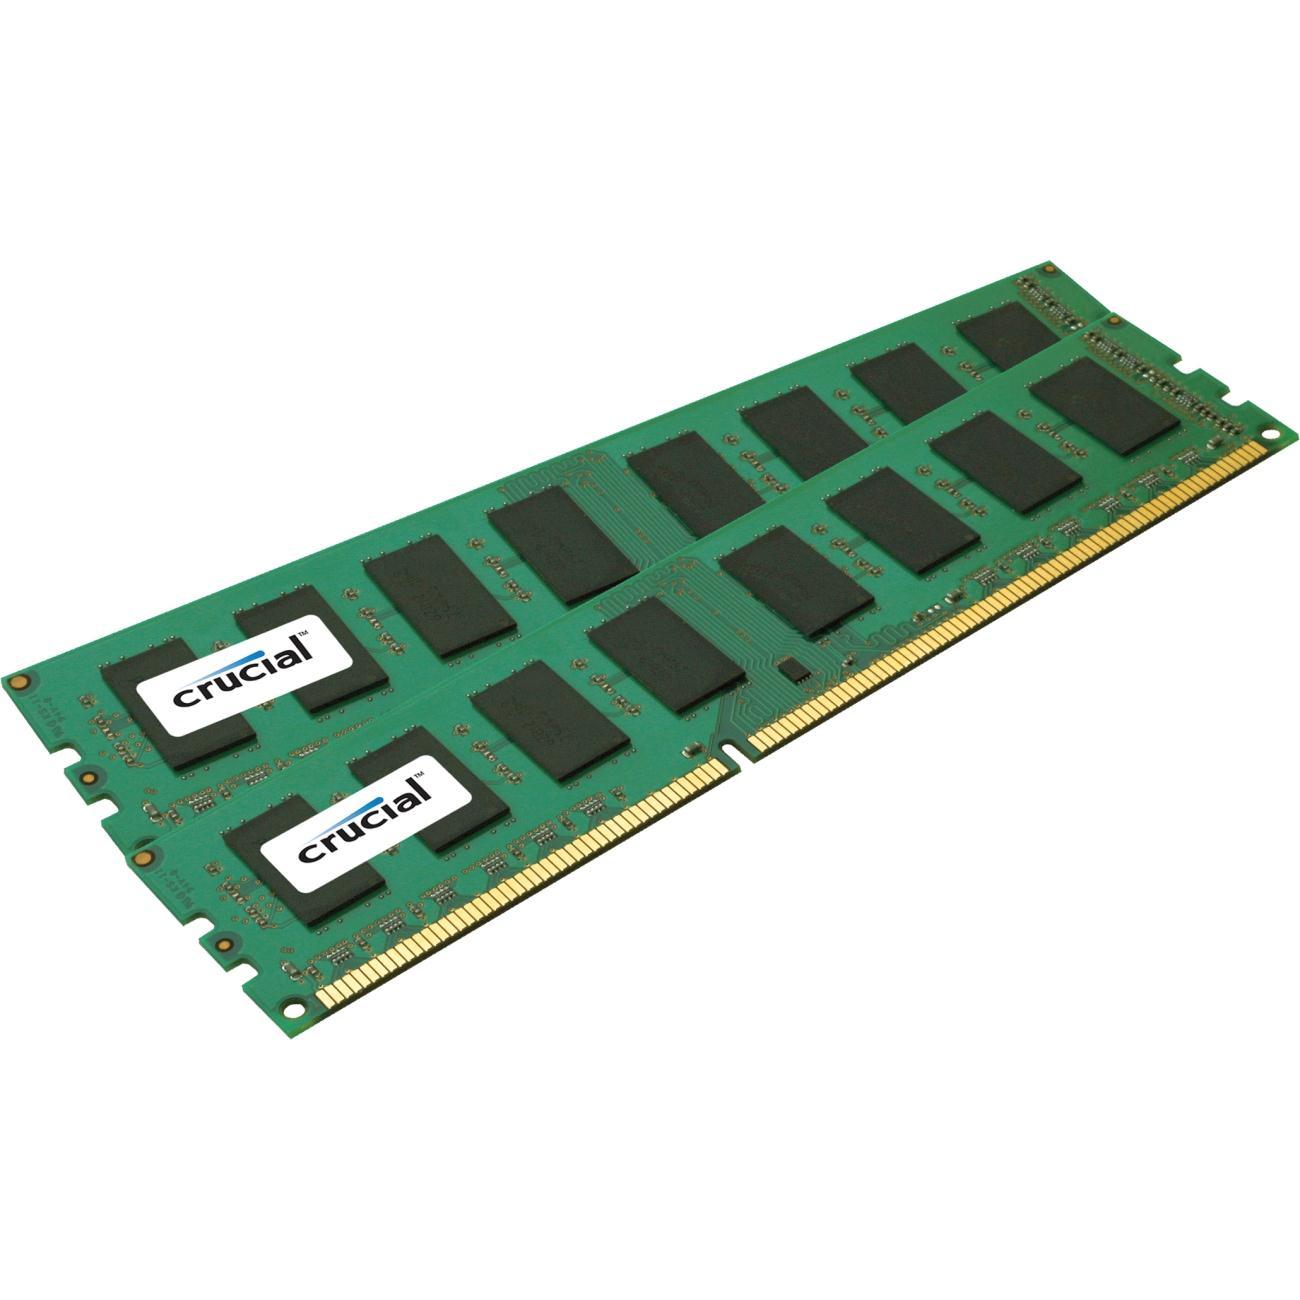 Crucial CT2C16G3R186DM memory module